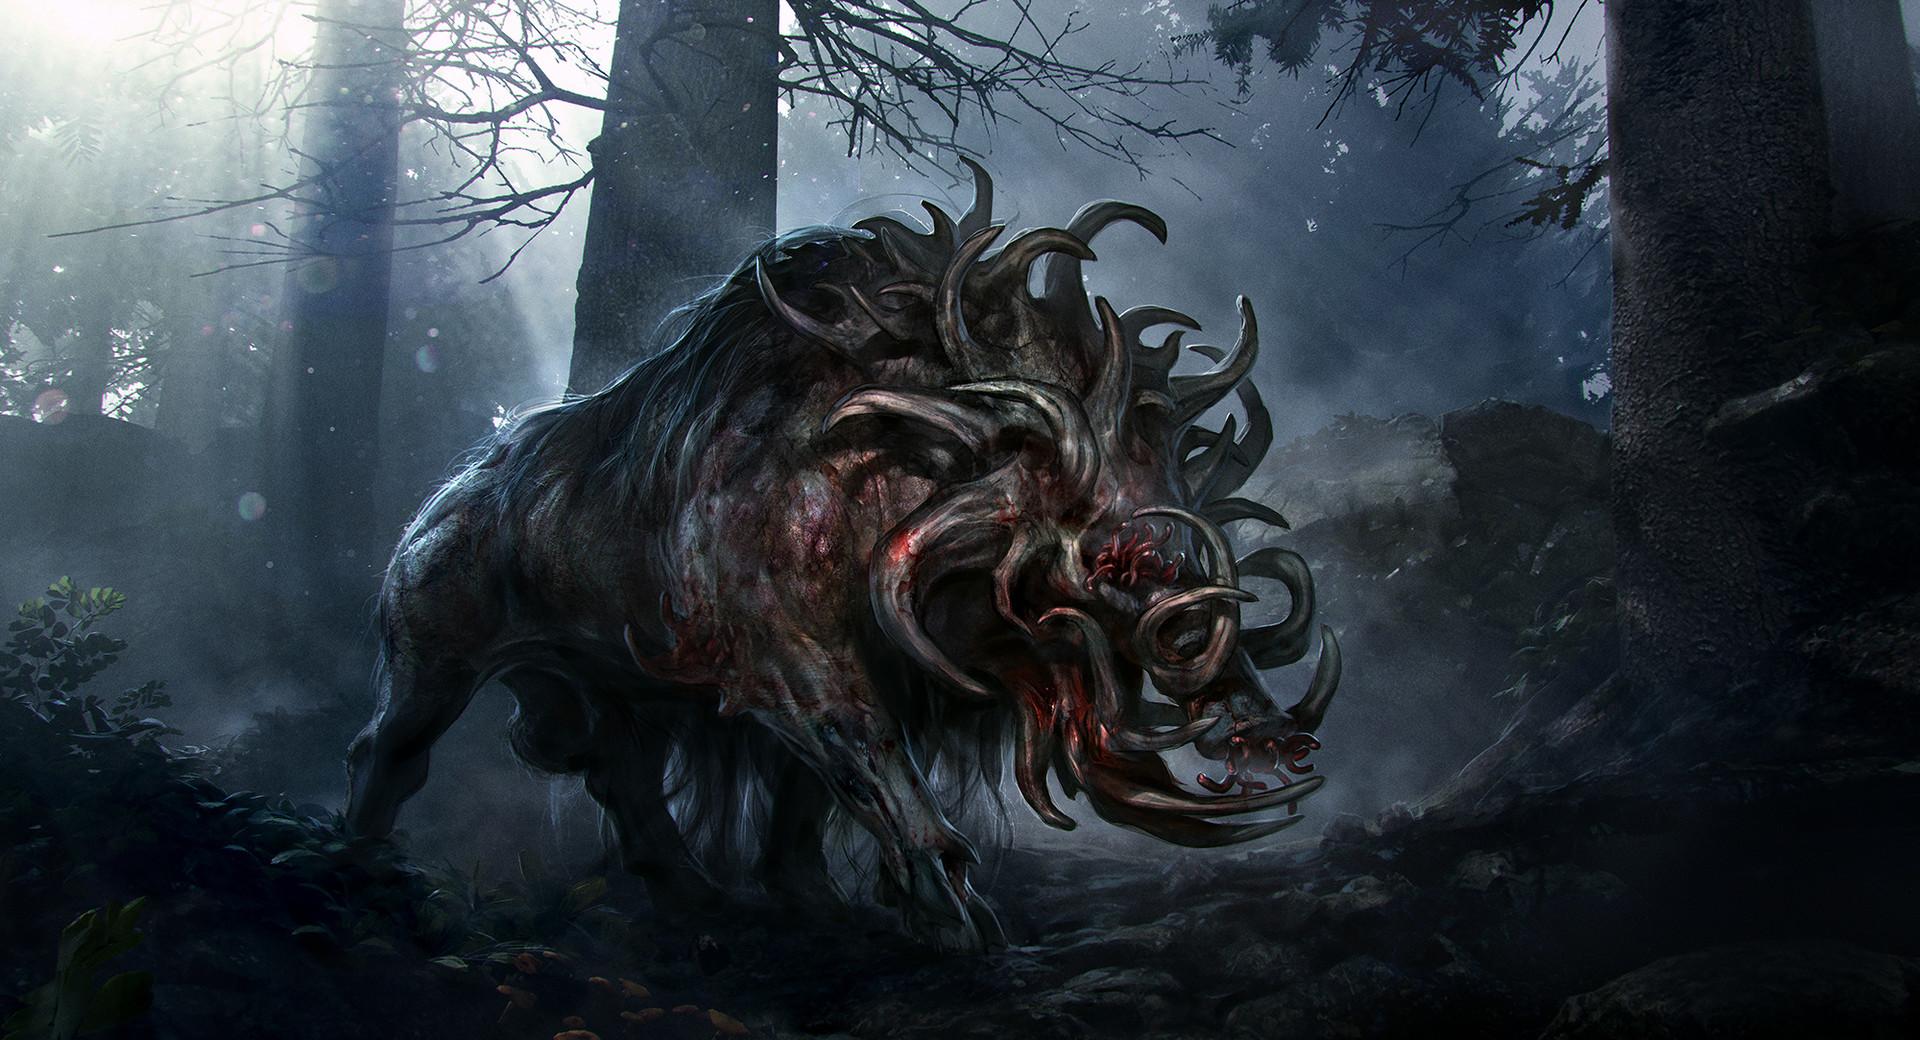 General 1920x1040 digital art creature forest blood Princess Mononoke anime Studio Ghibli boars demon demon horns